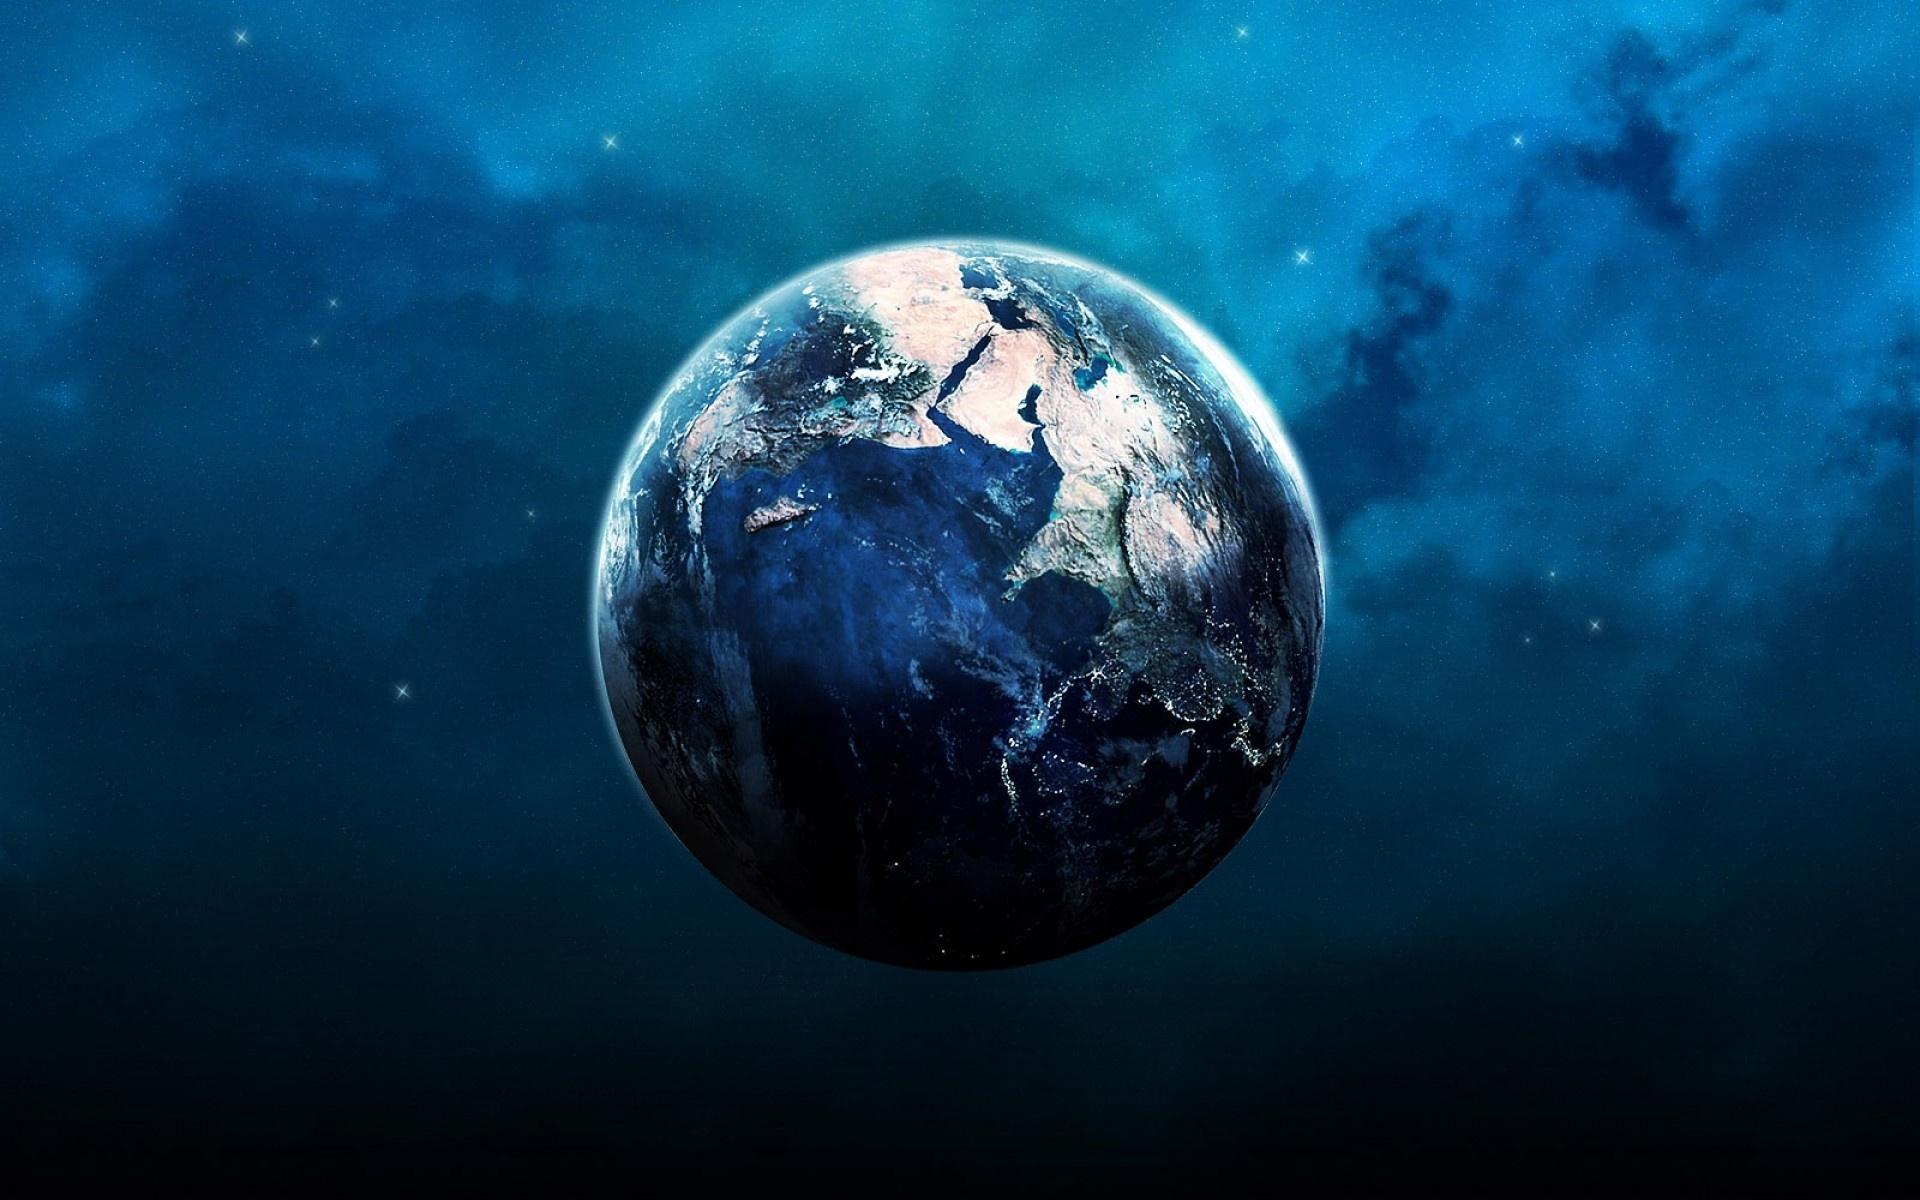 planet-earth-globe.jpg